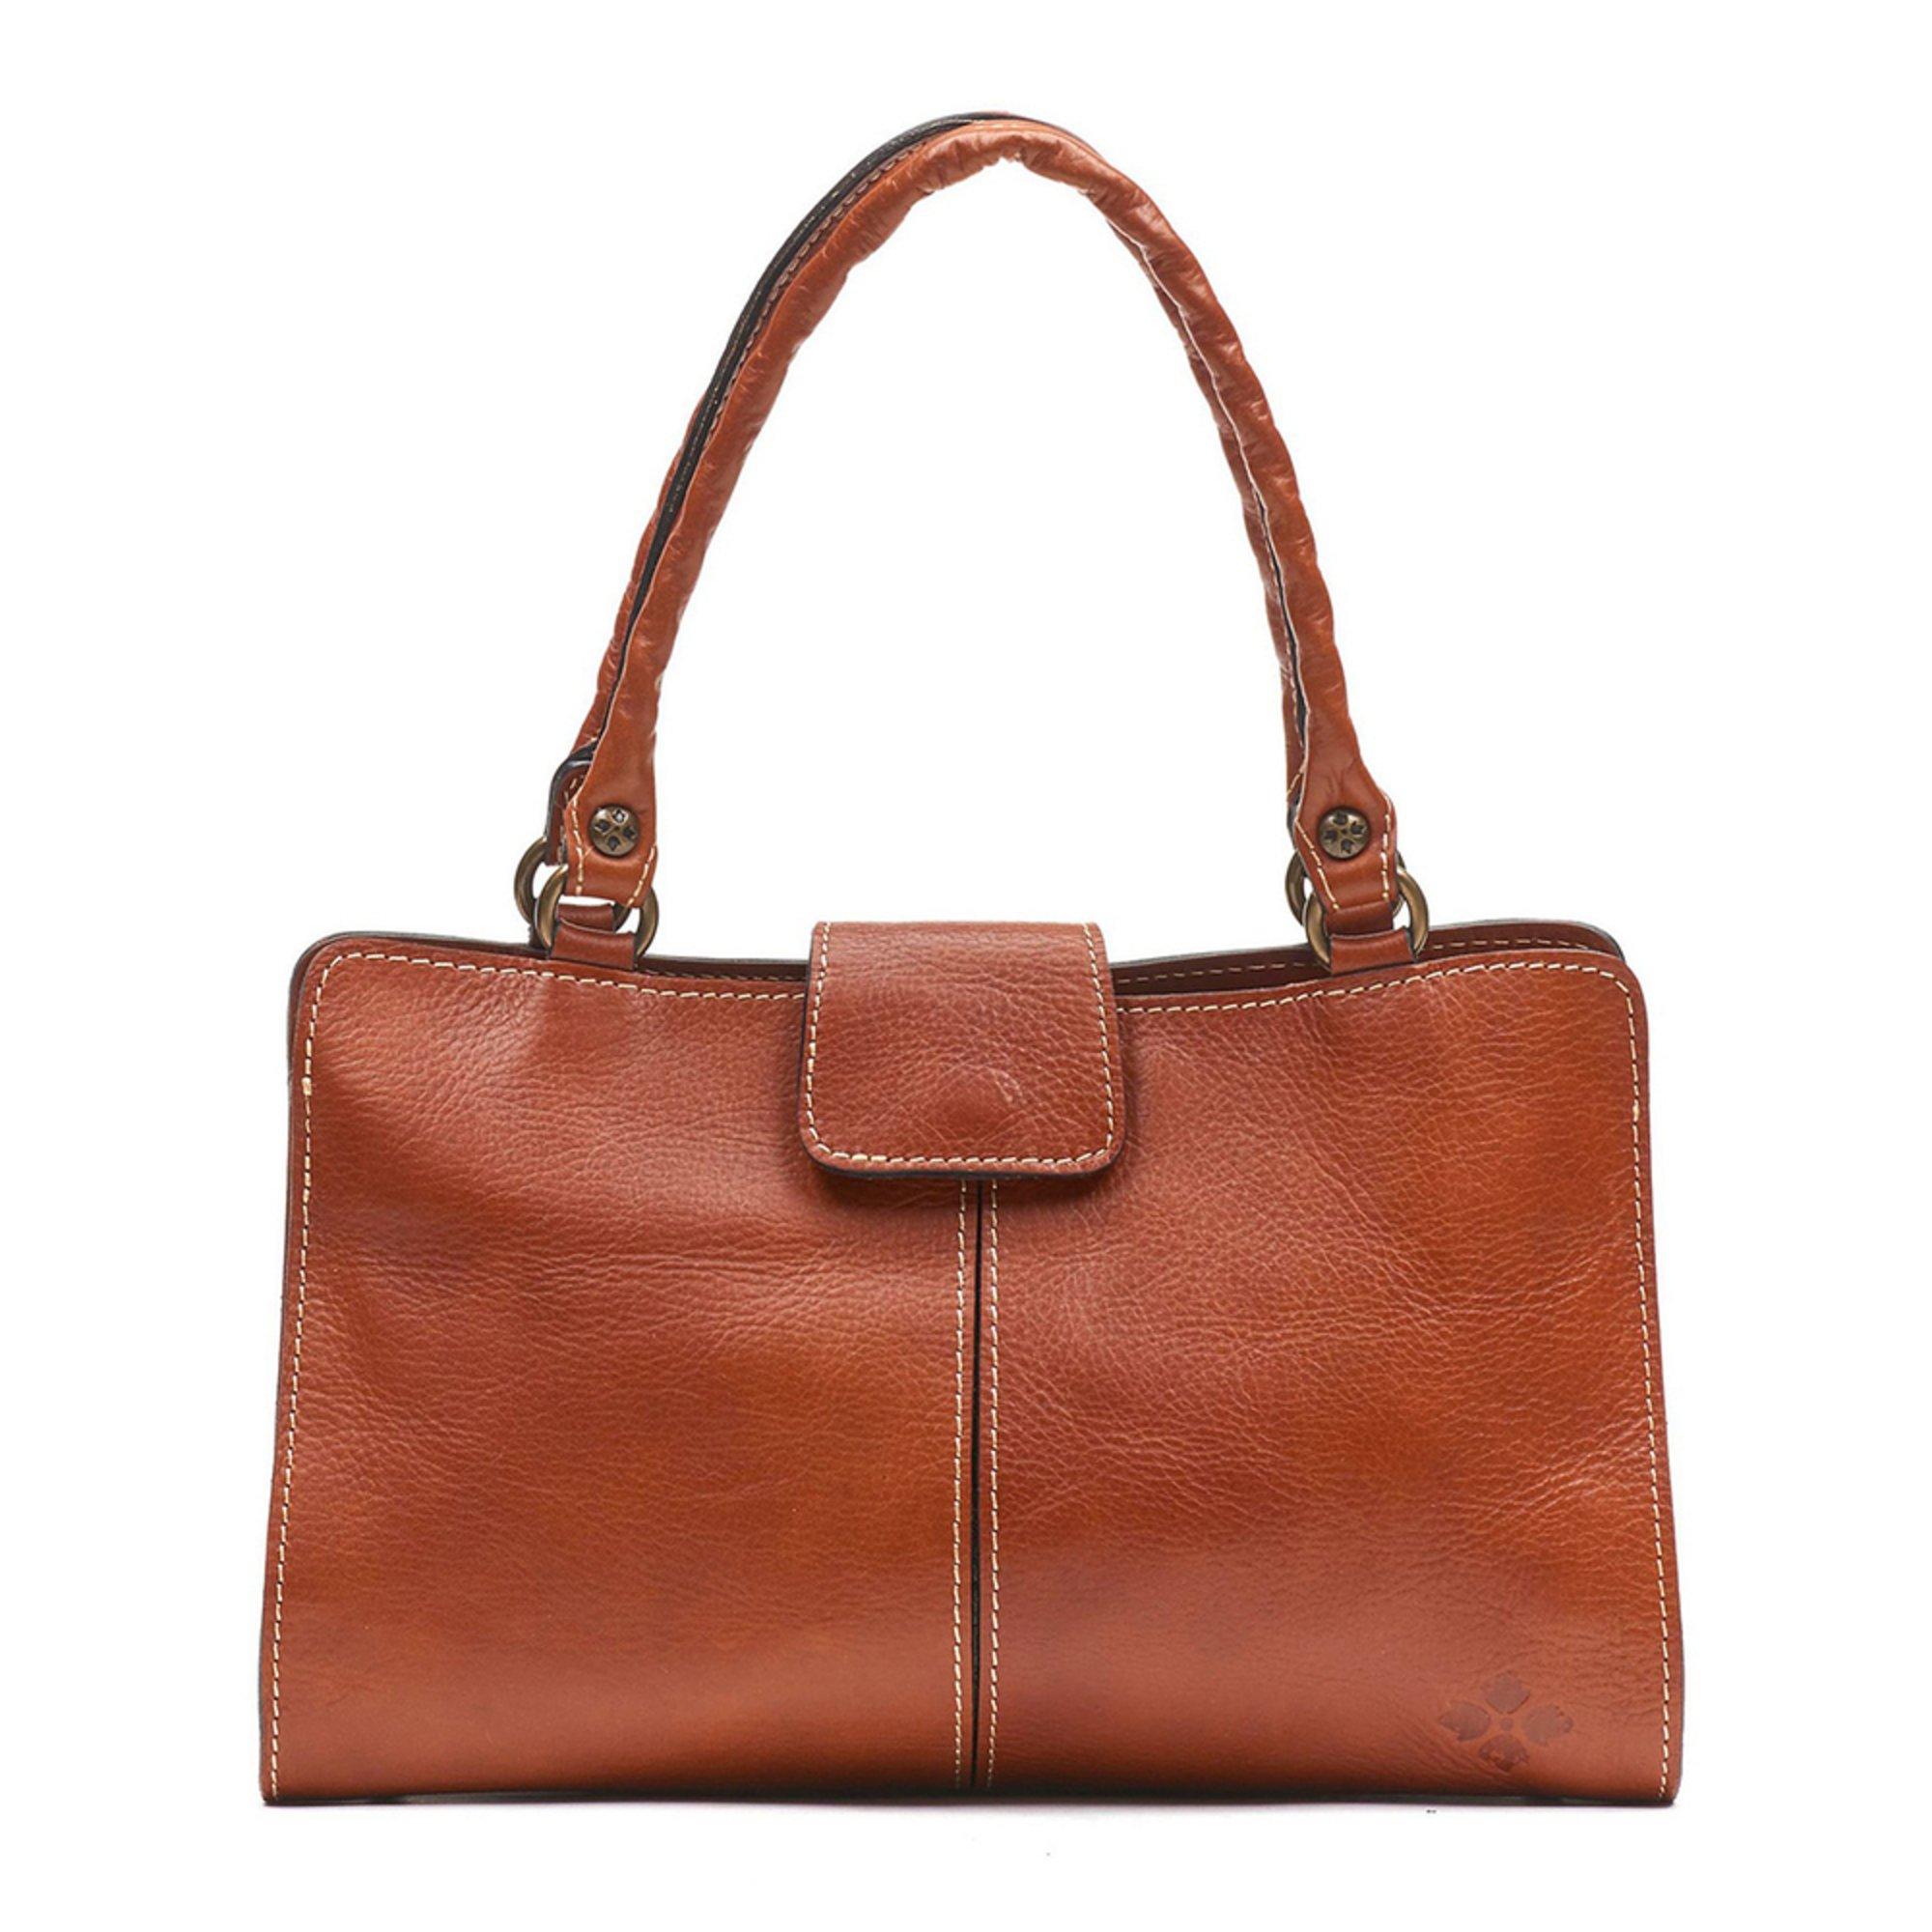 Patricia Nash Rienzo Satchel Tan | Handbags